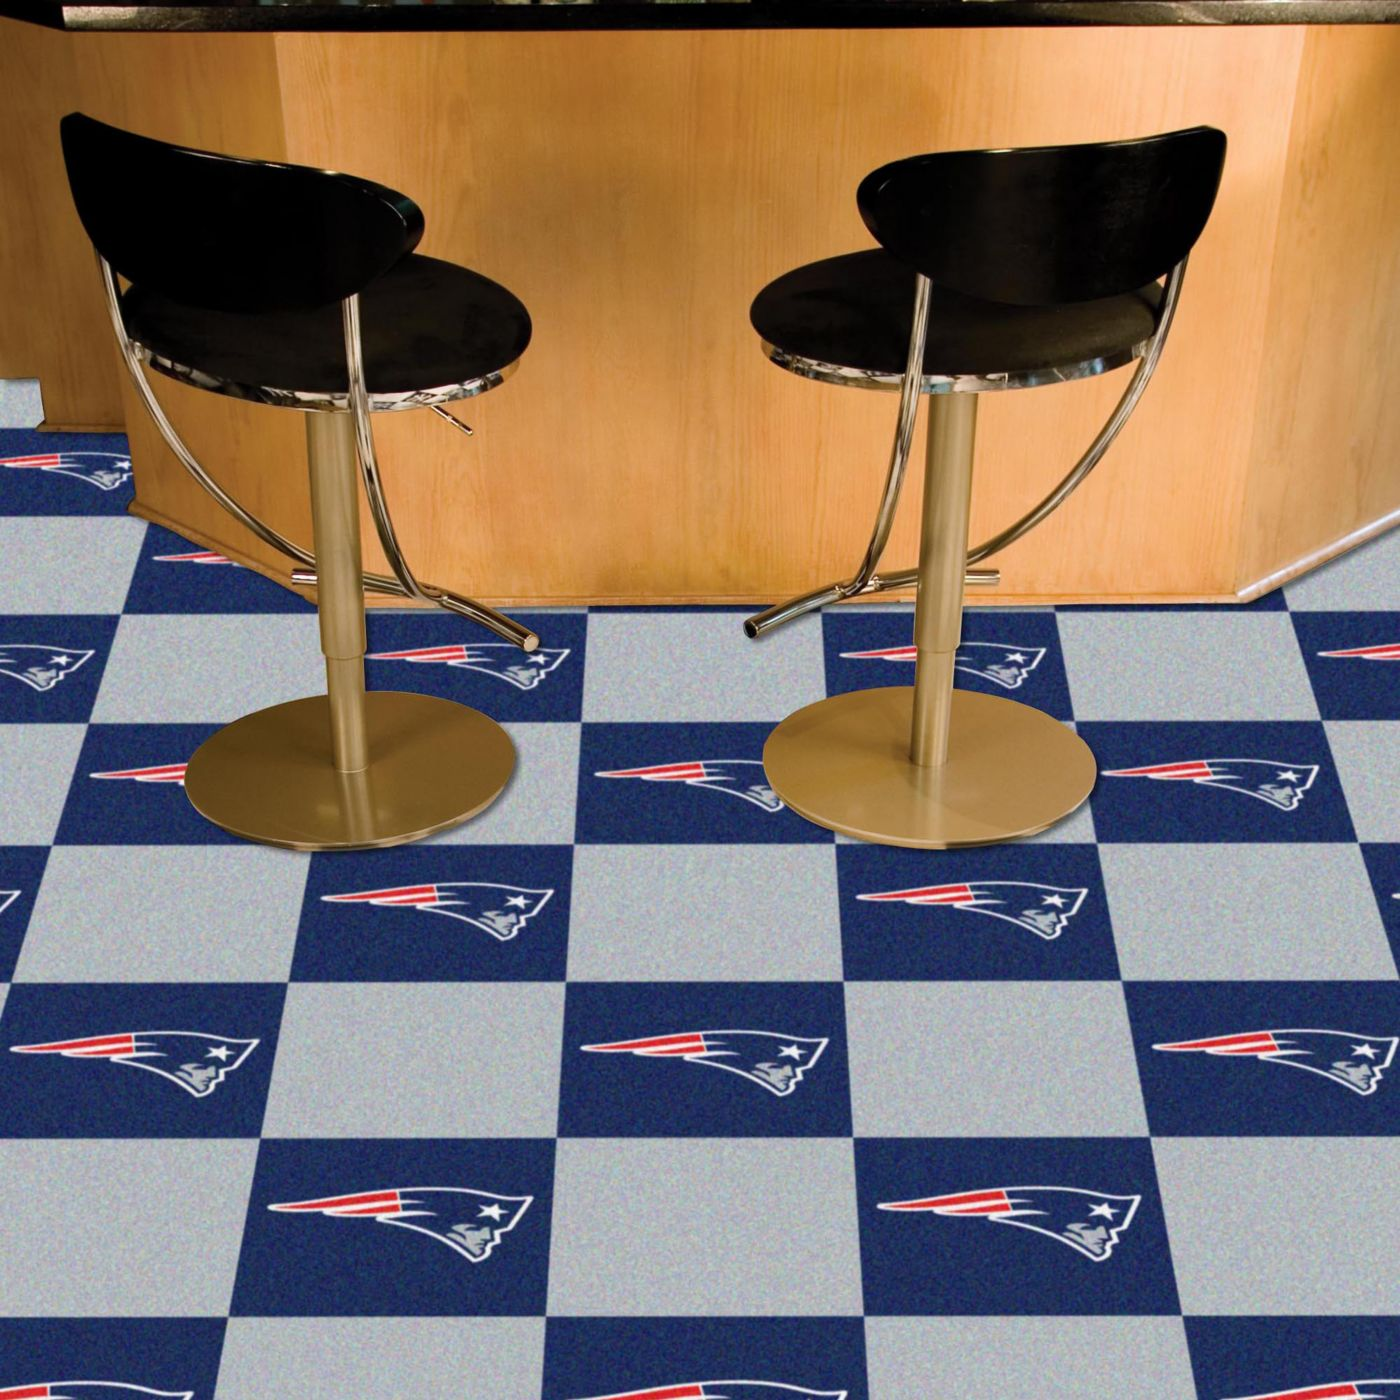 FANMATS New England Patriots Team Carpet Tiles